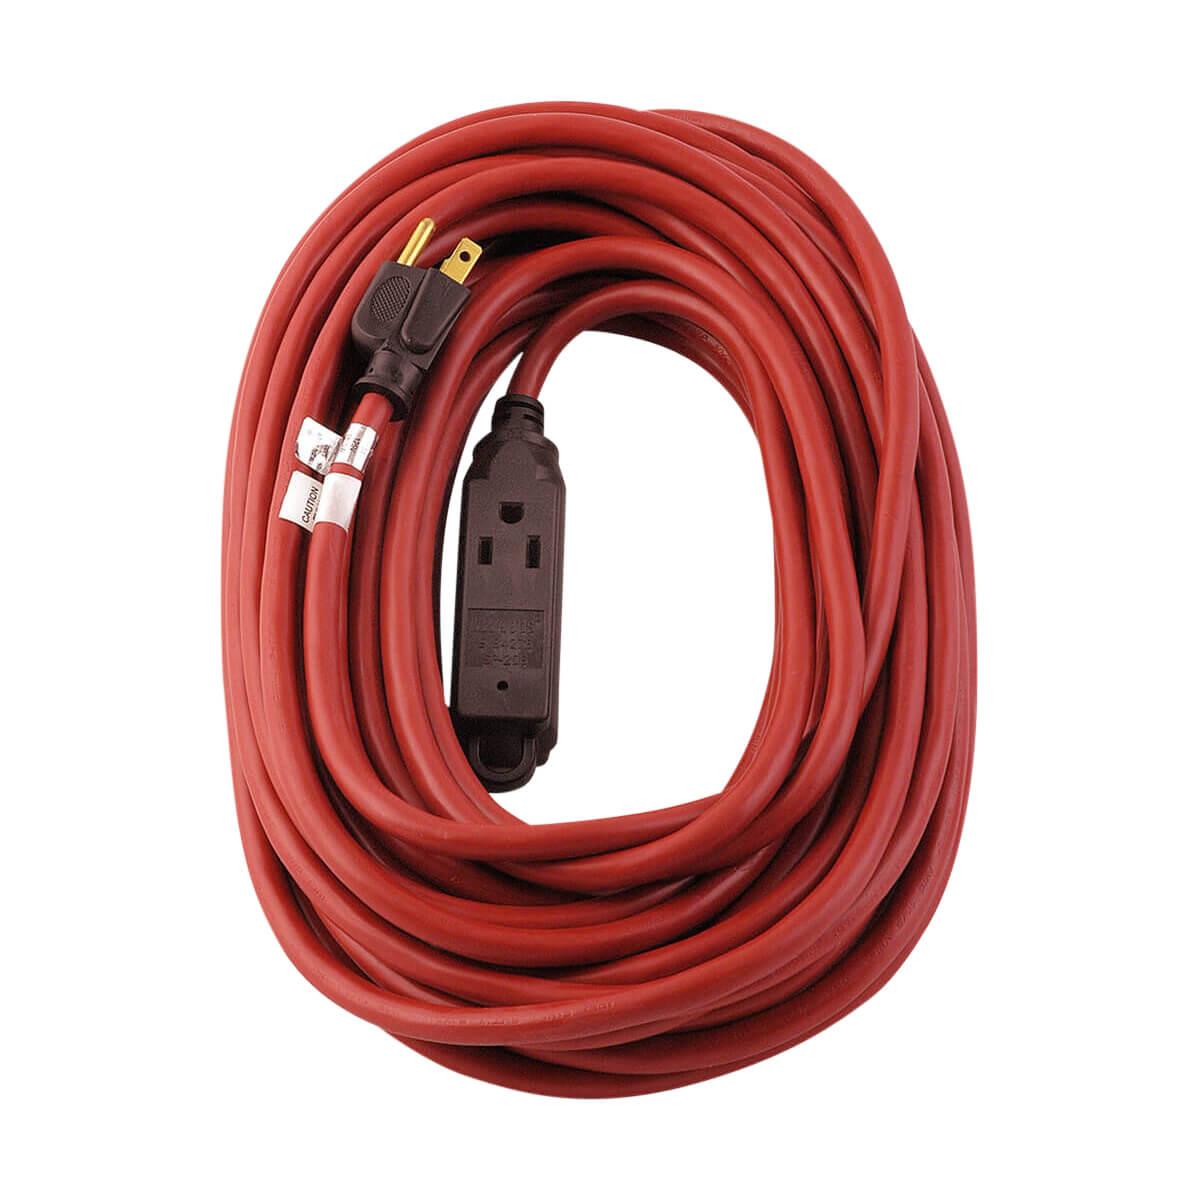 Outdoor Extension Cord - 14/3 30M SJTW